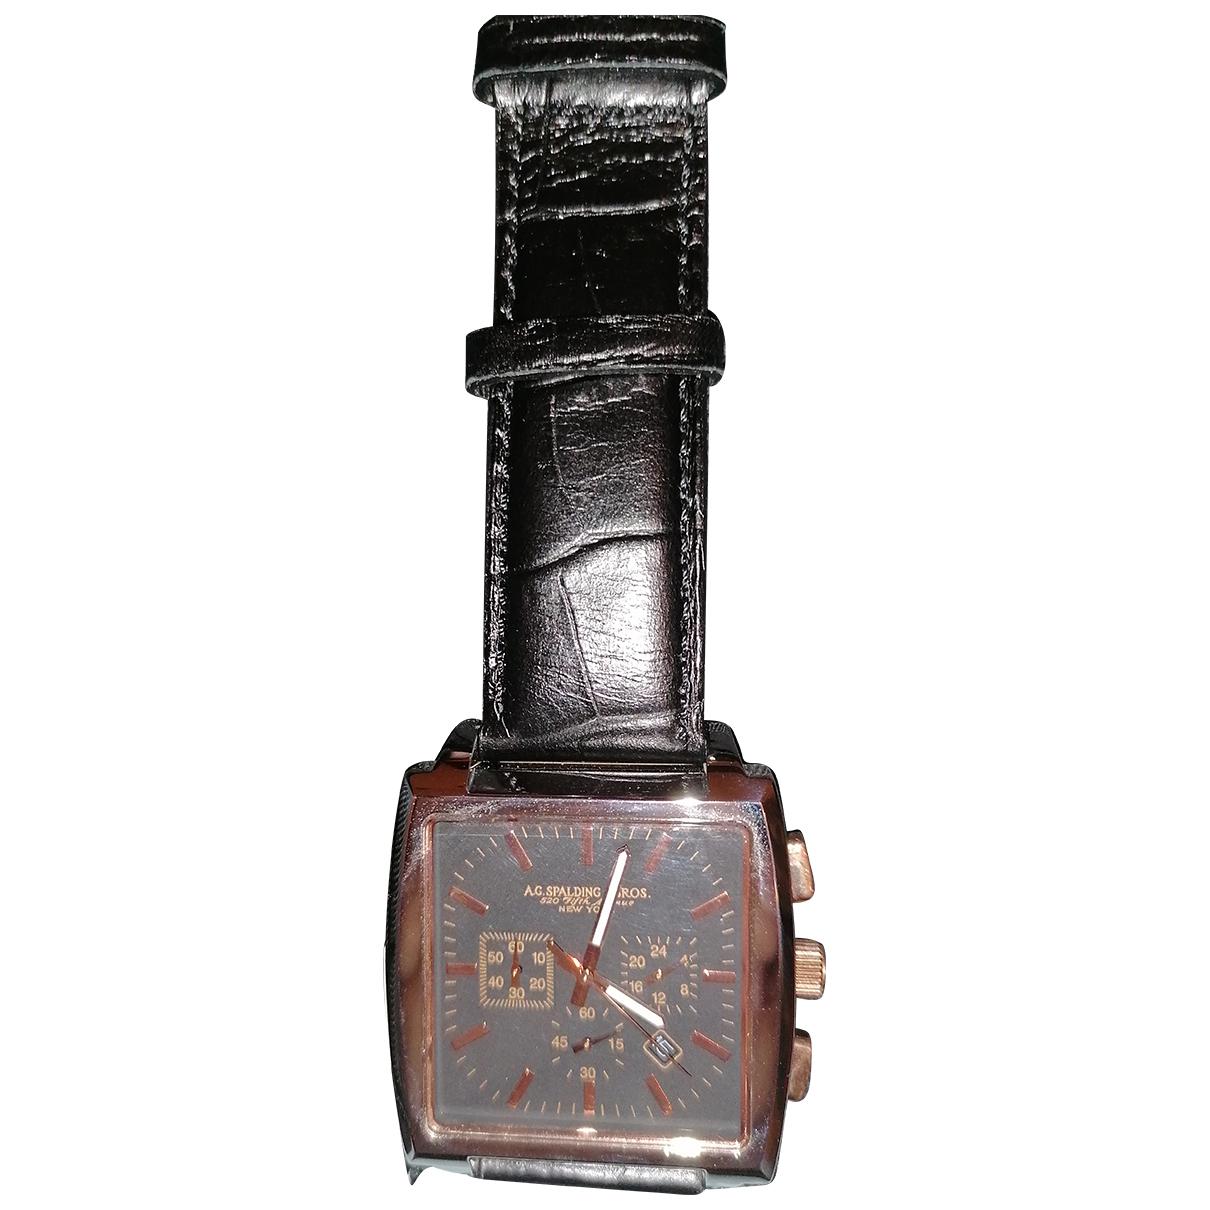 Relojes Ag Spalding & Bros